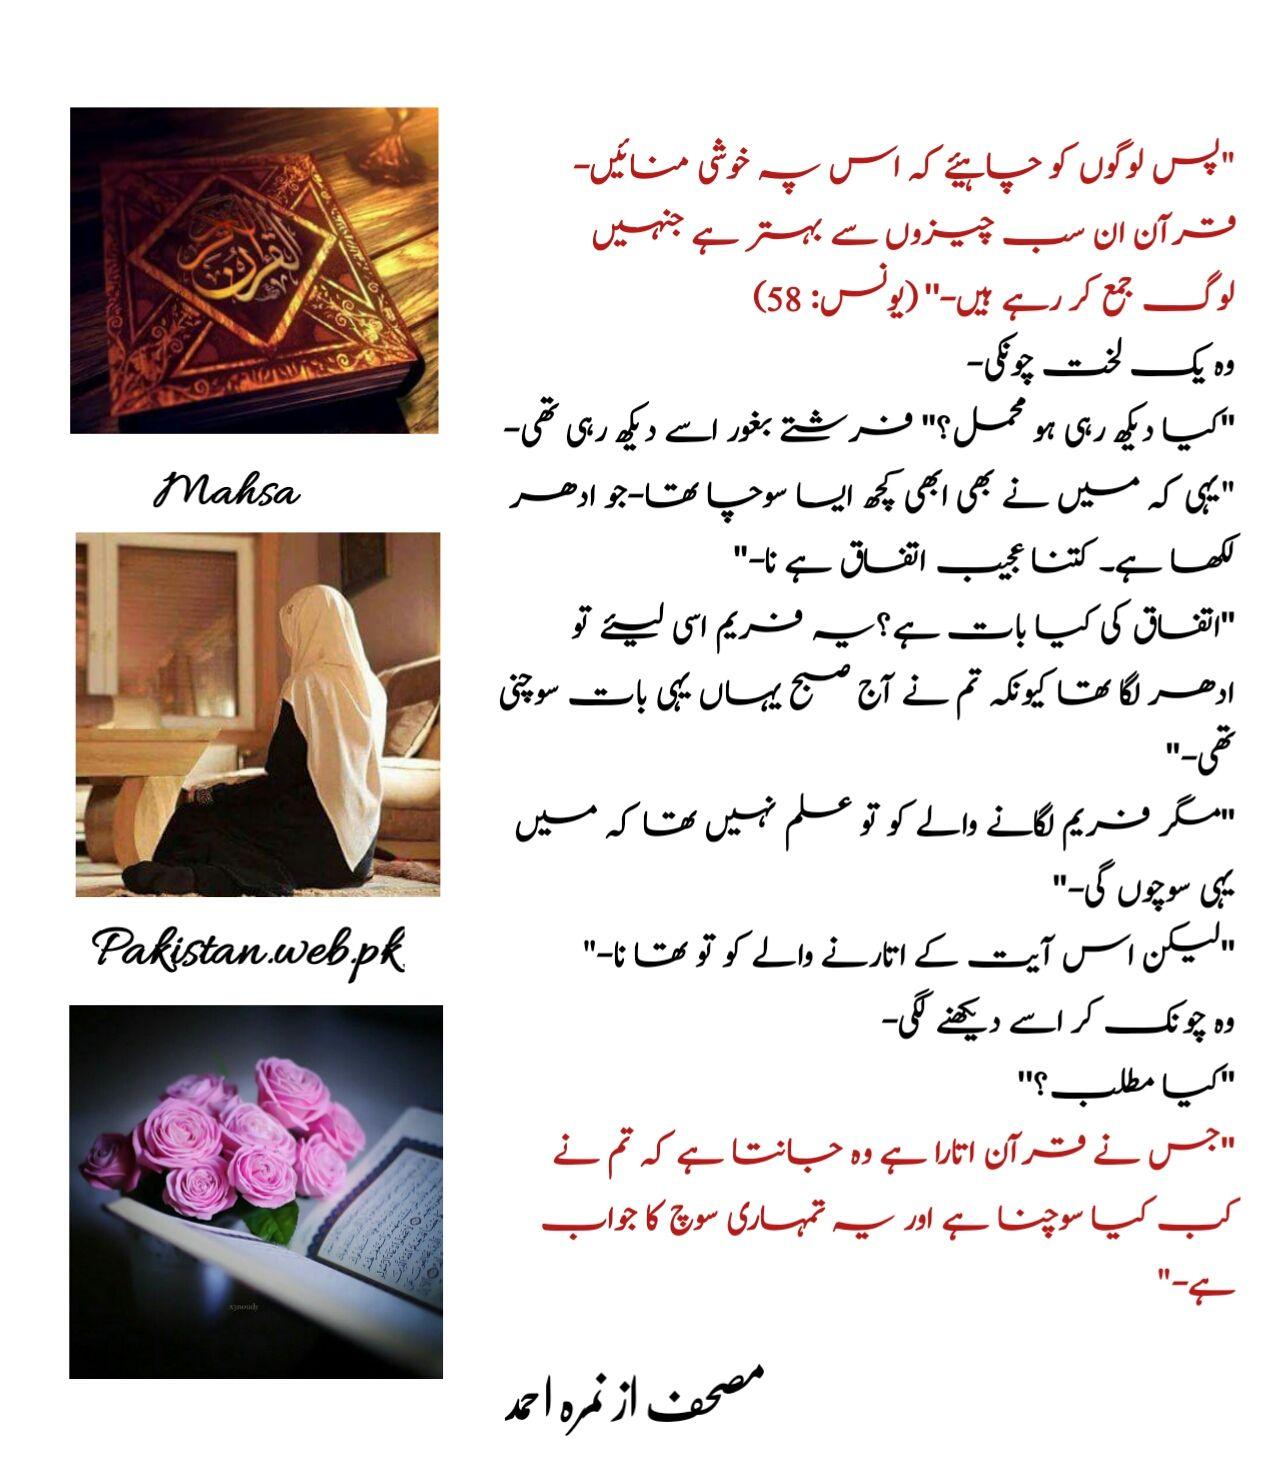 Quran Un Sab Cheezon Se Behtar Hai Jinhein Log Jama Kar